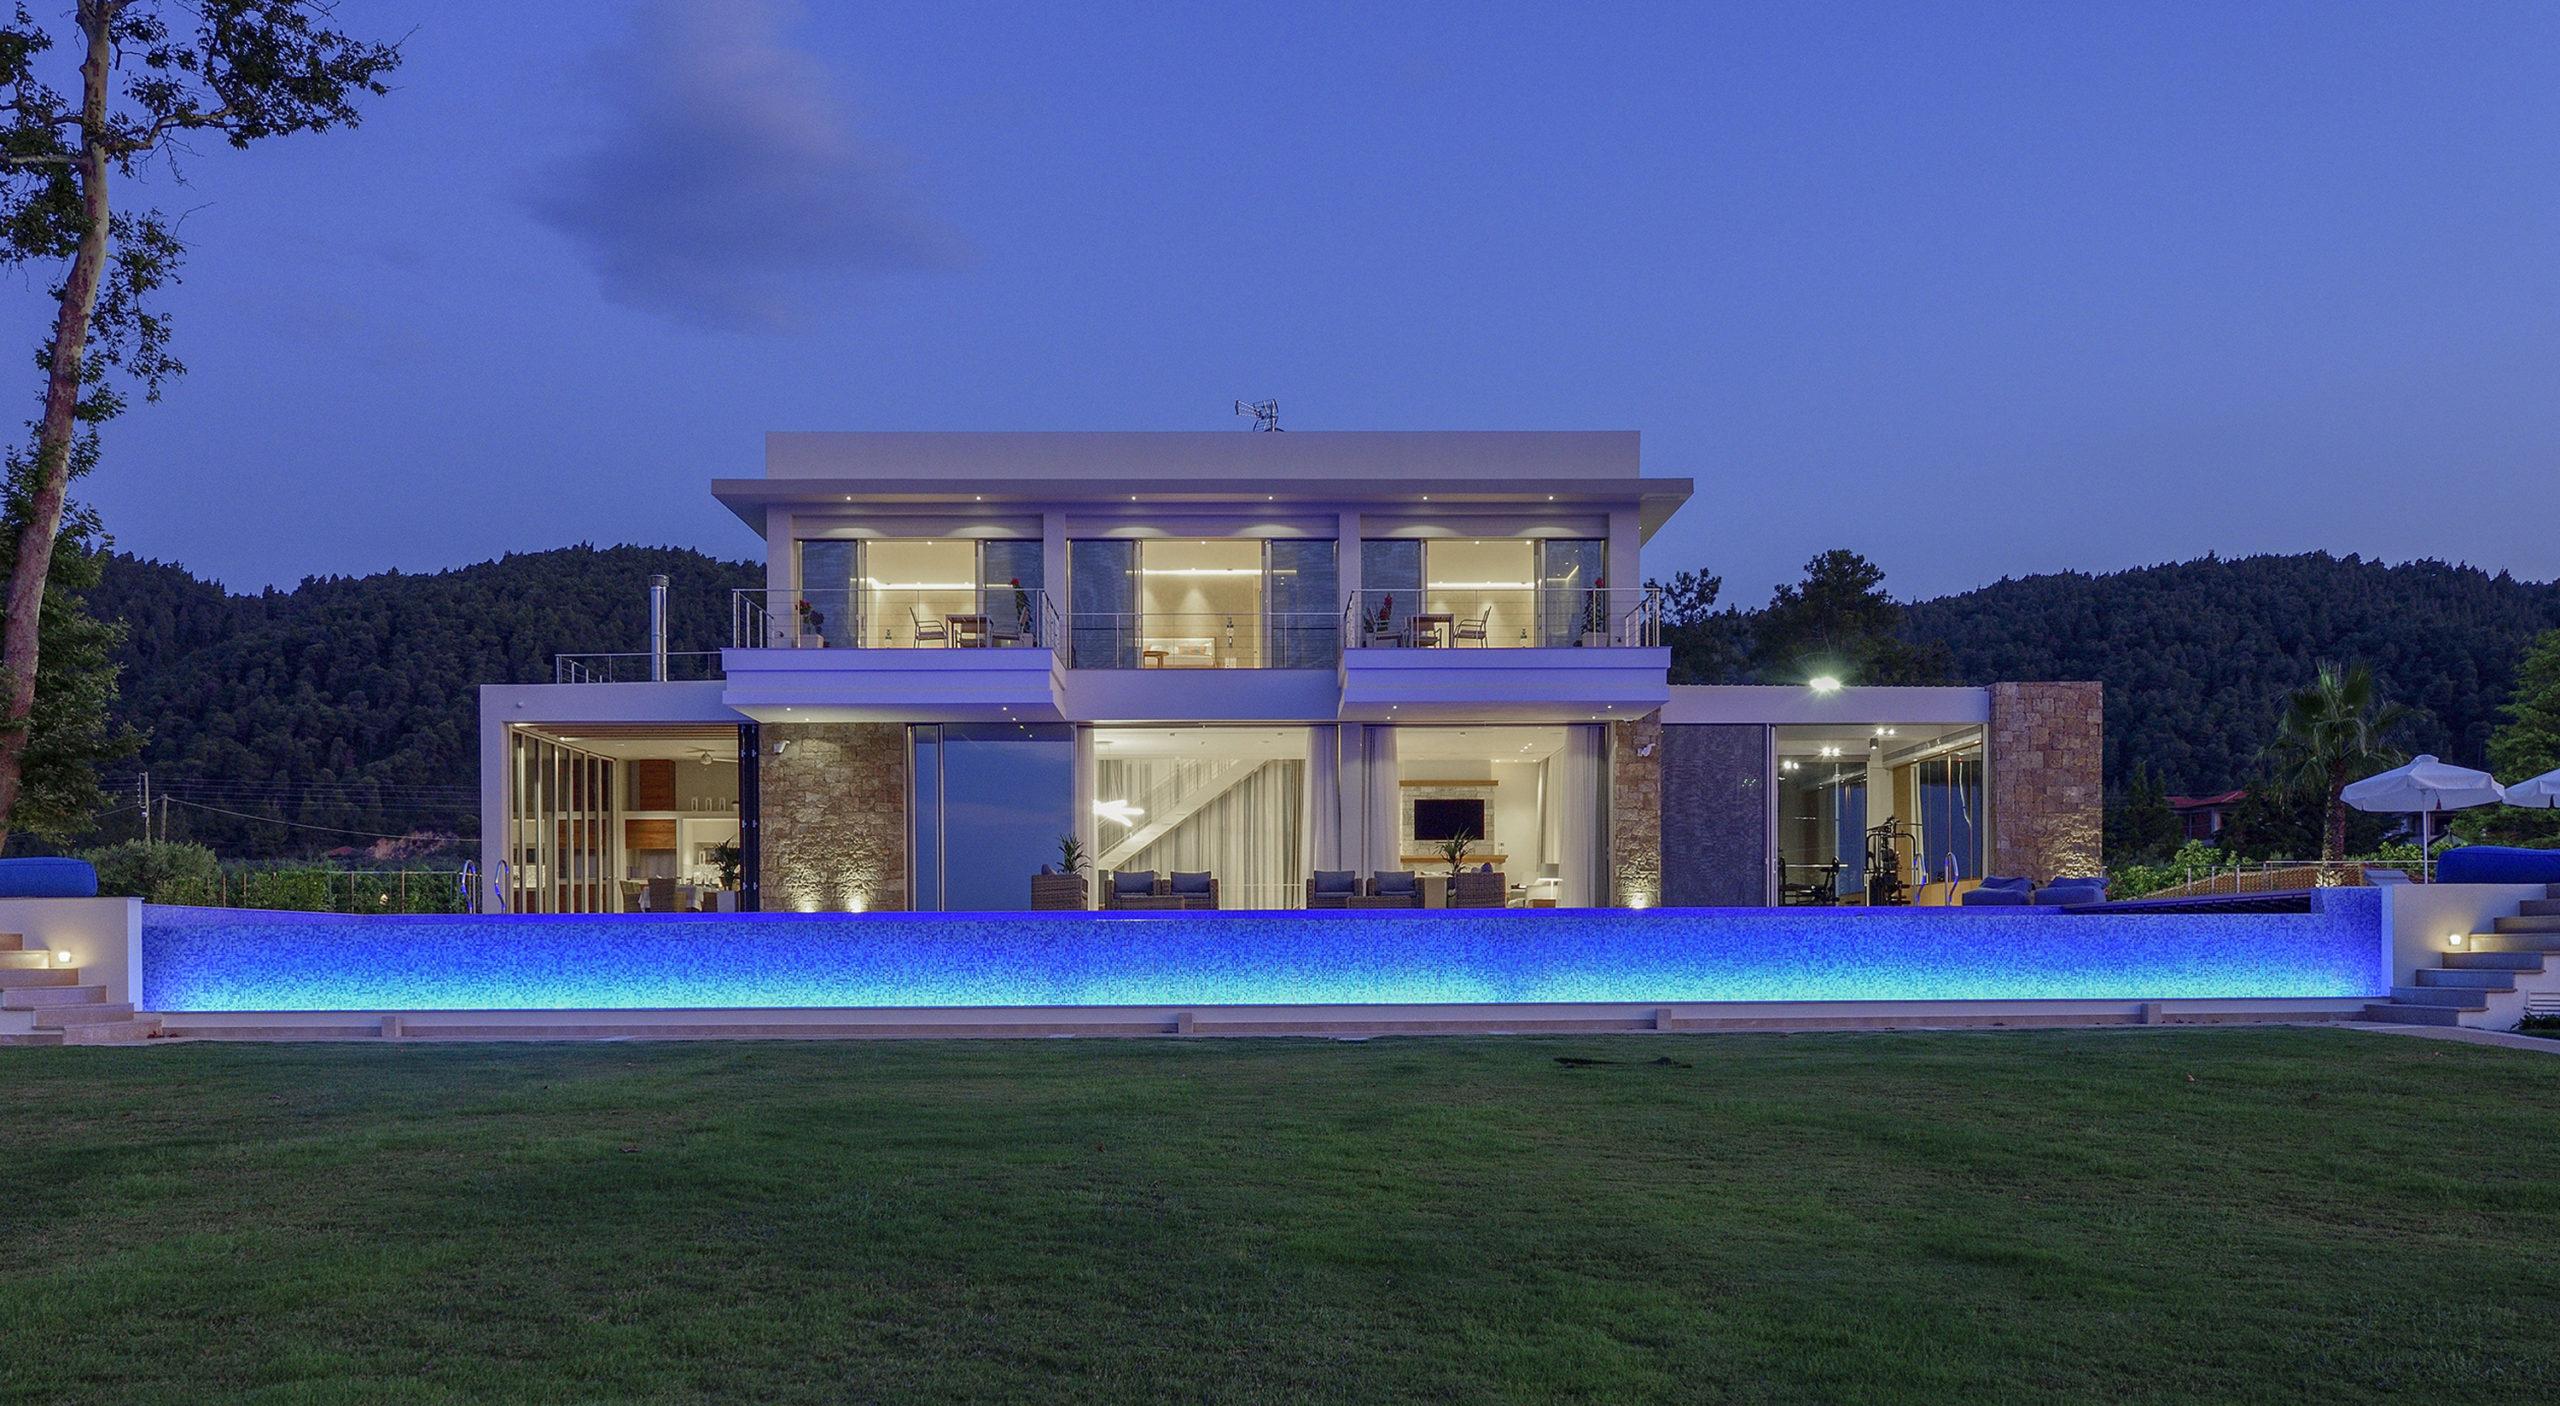 Villa Natalia Front photo sunset with lights on blue pool